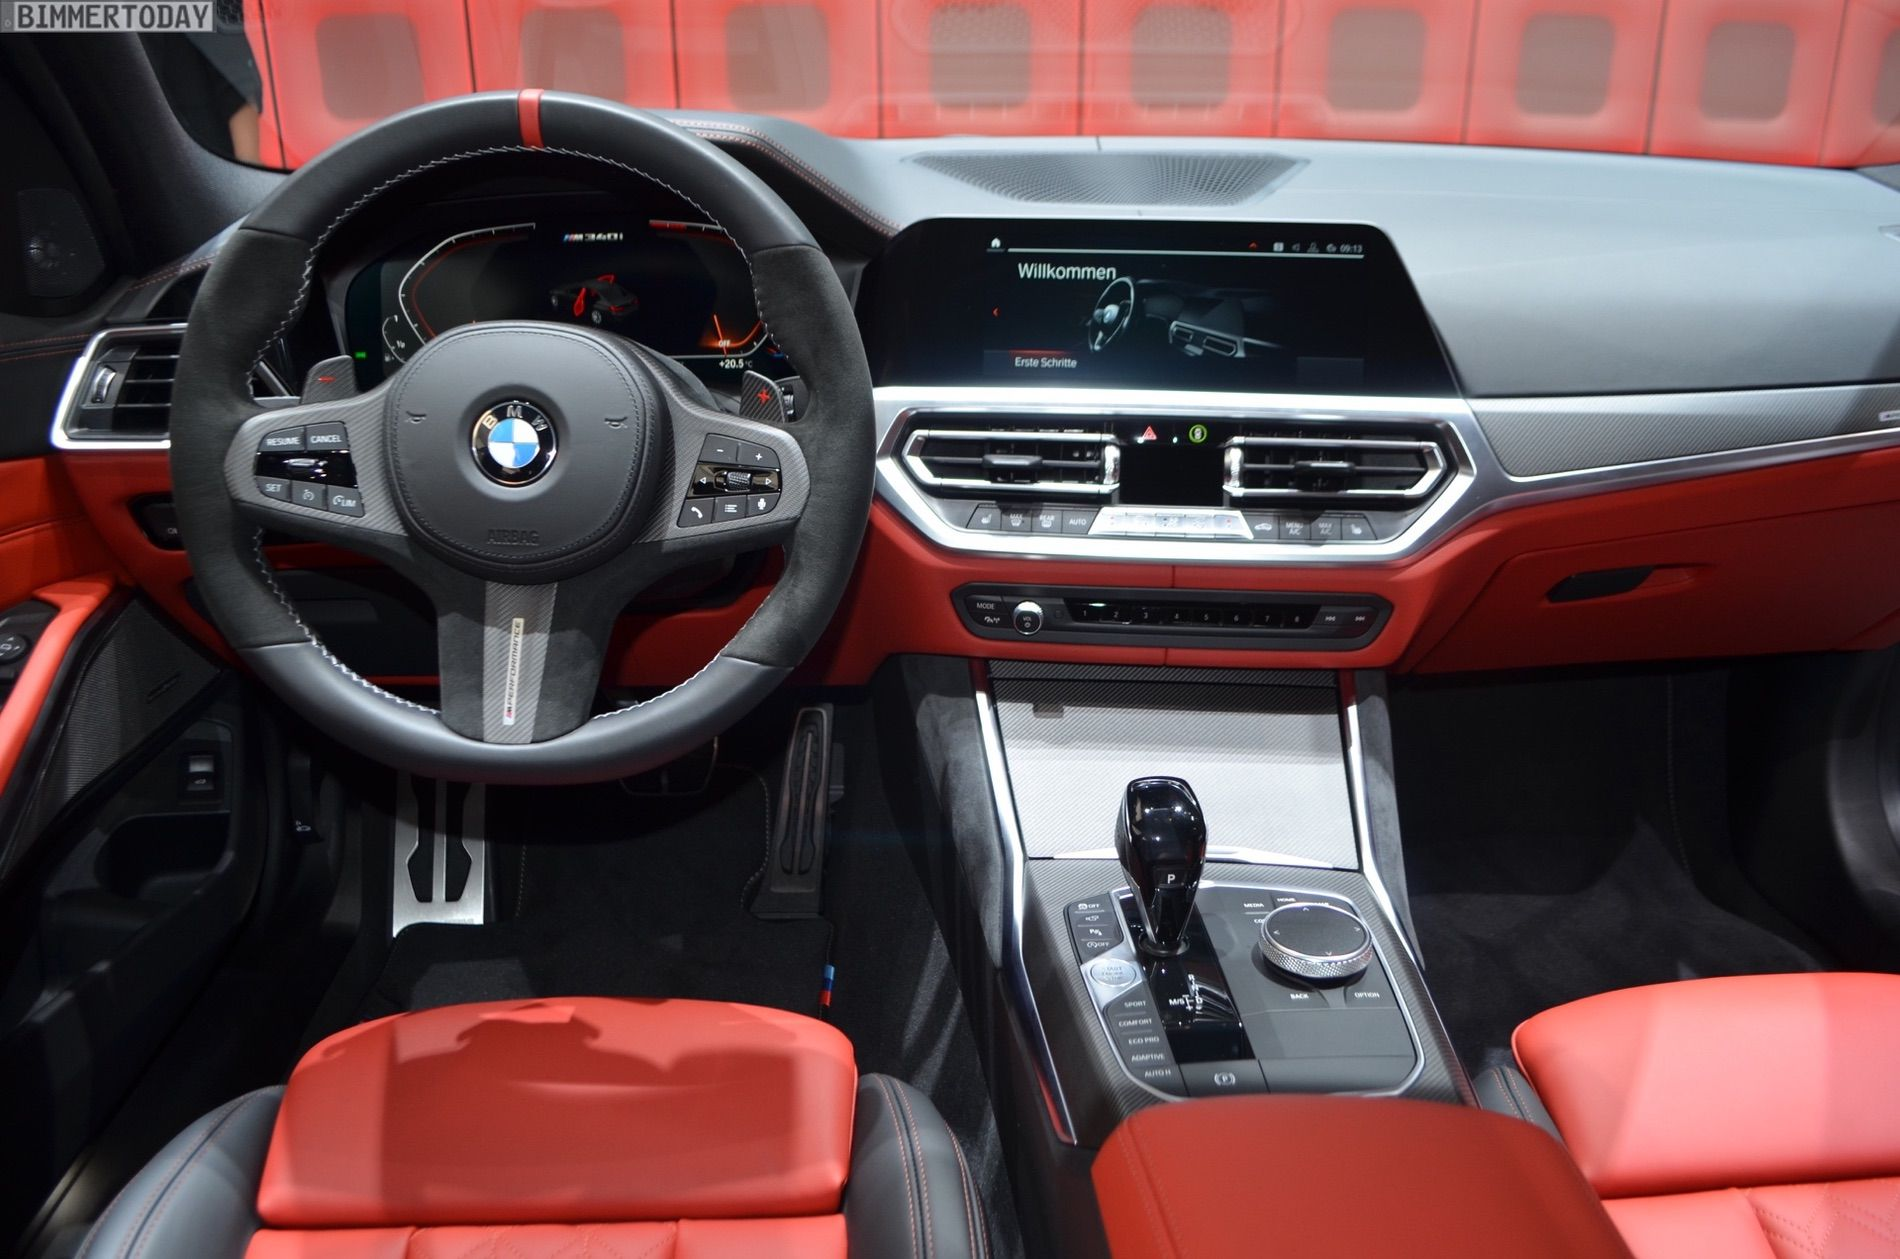 Geneva 2019: BMW M340i G20 with M Performance Parts